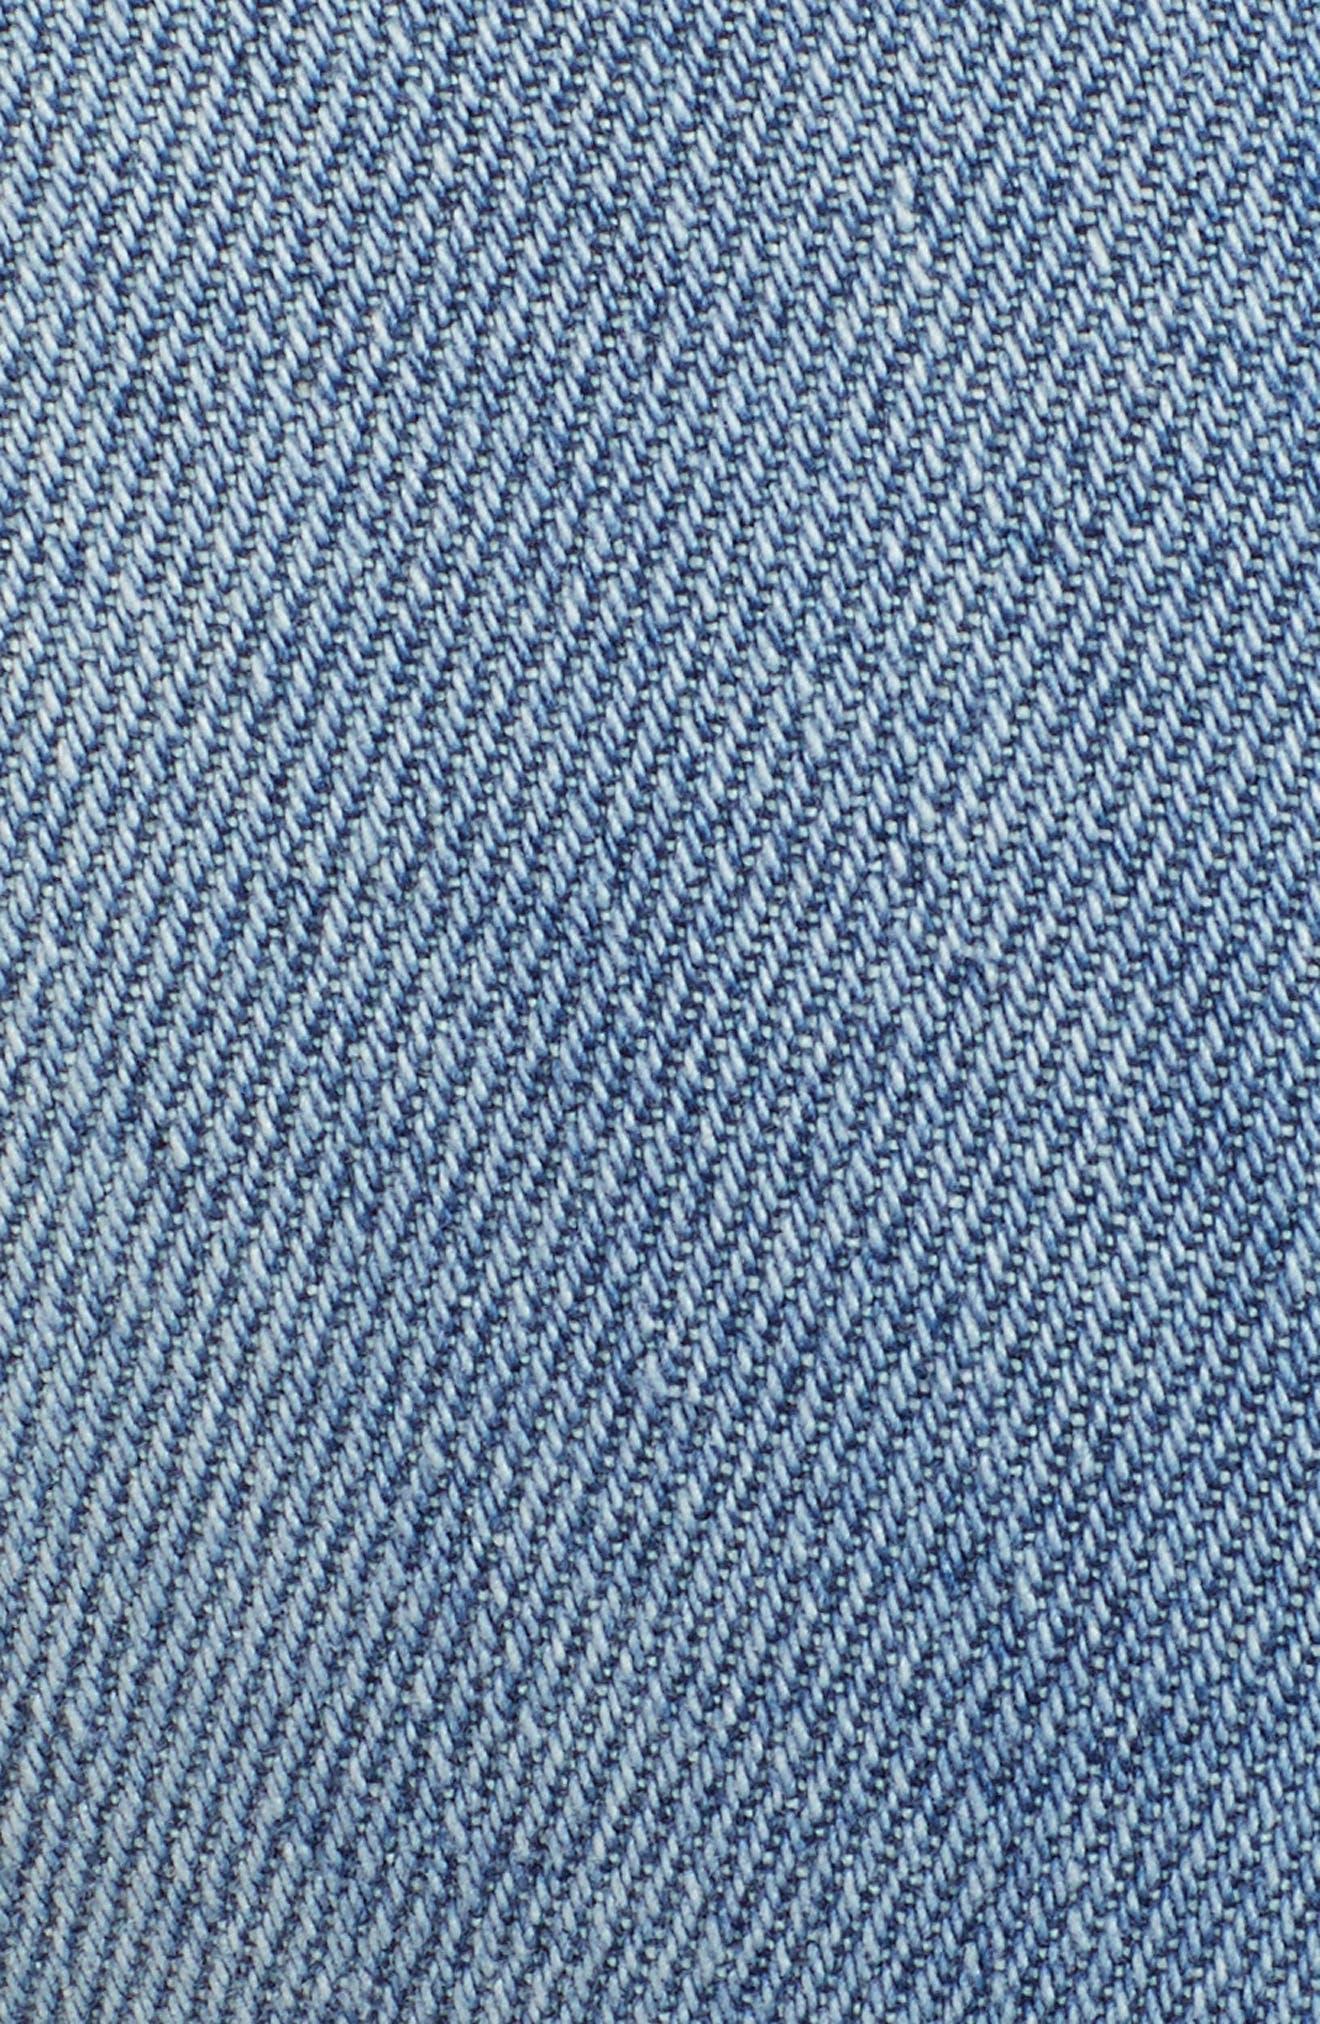 Brie High Waist Ripped Skinny Jeans,                             Alternate thumbnail 6, color,                             BRADFORD LIGHT WASH